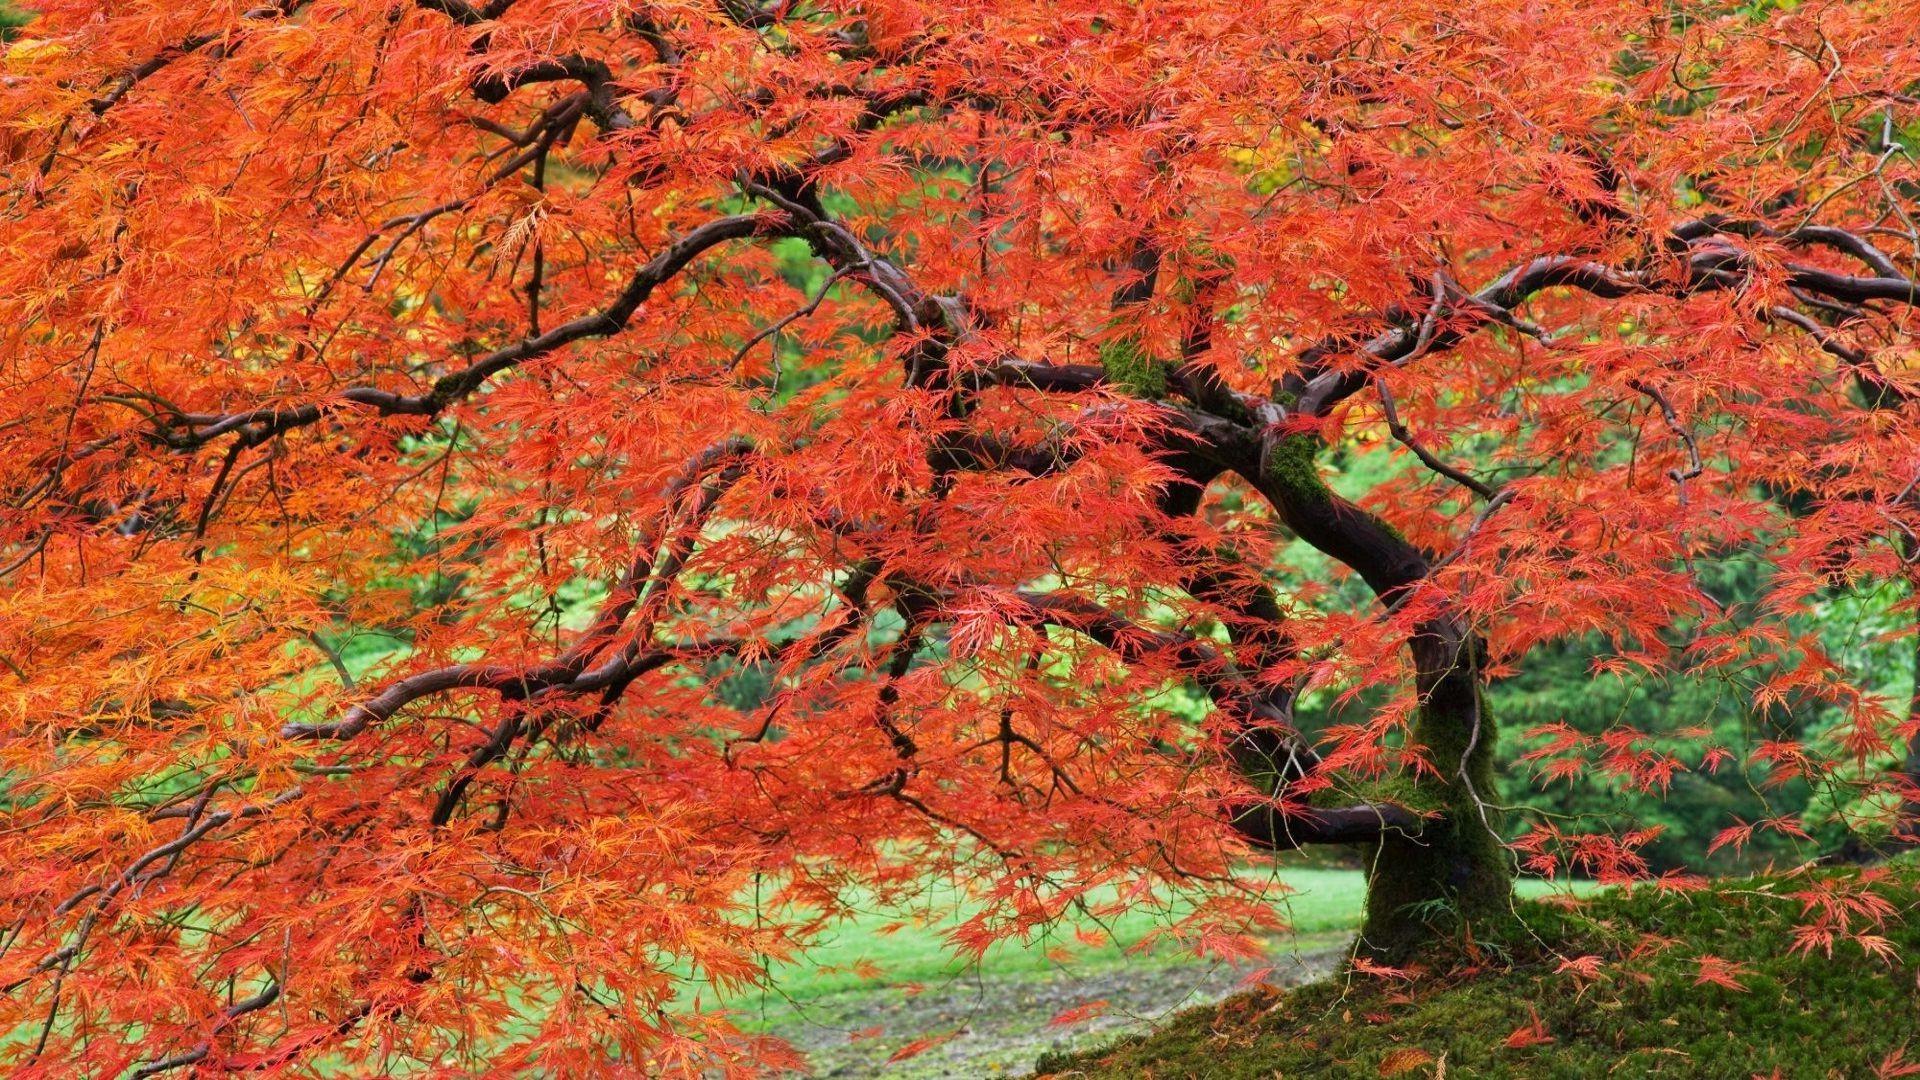 Portland Japanese Garden wallpaper 8284 1920x1080